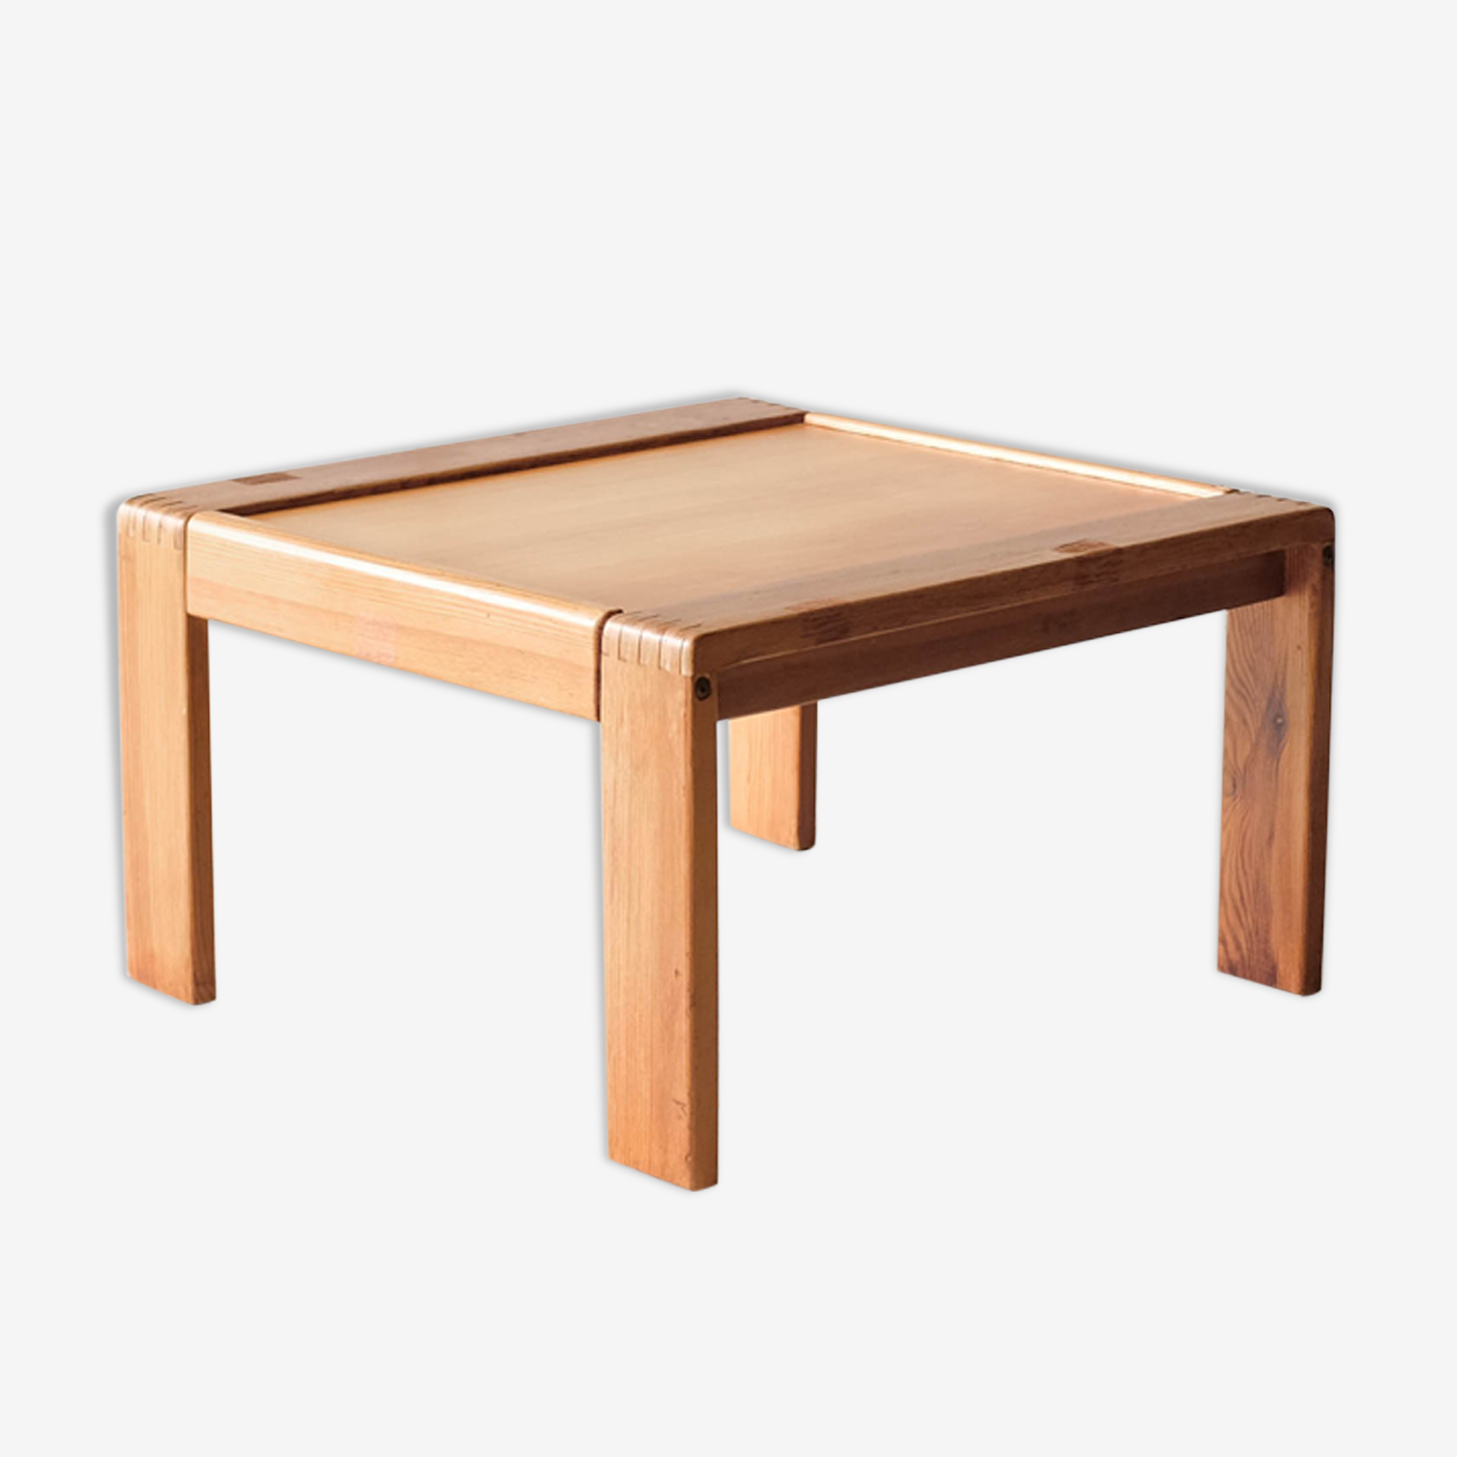 Table basse bois, style moderniste - Circa 1970